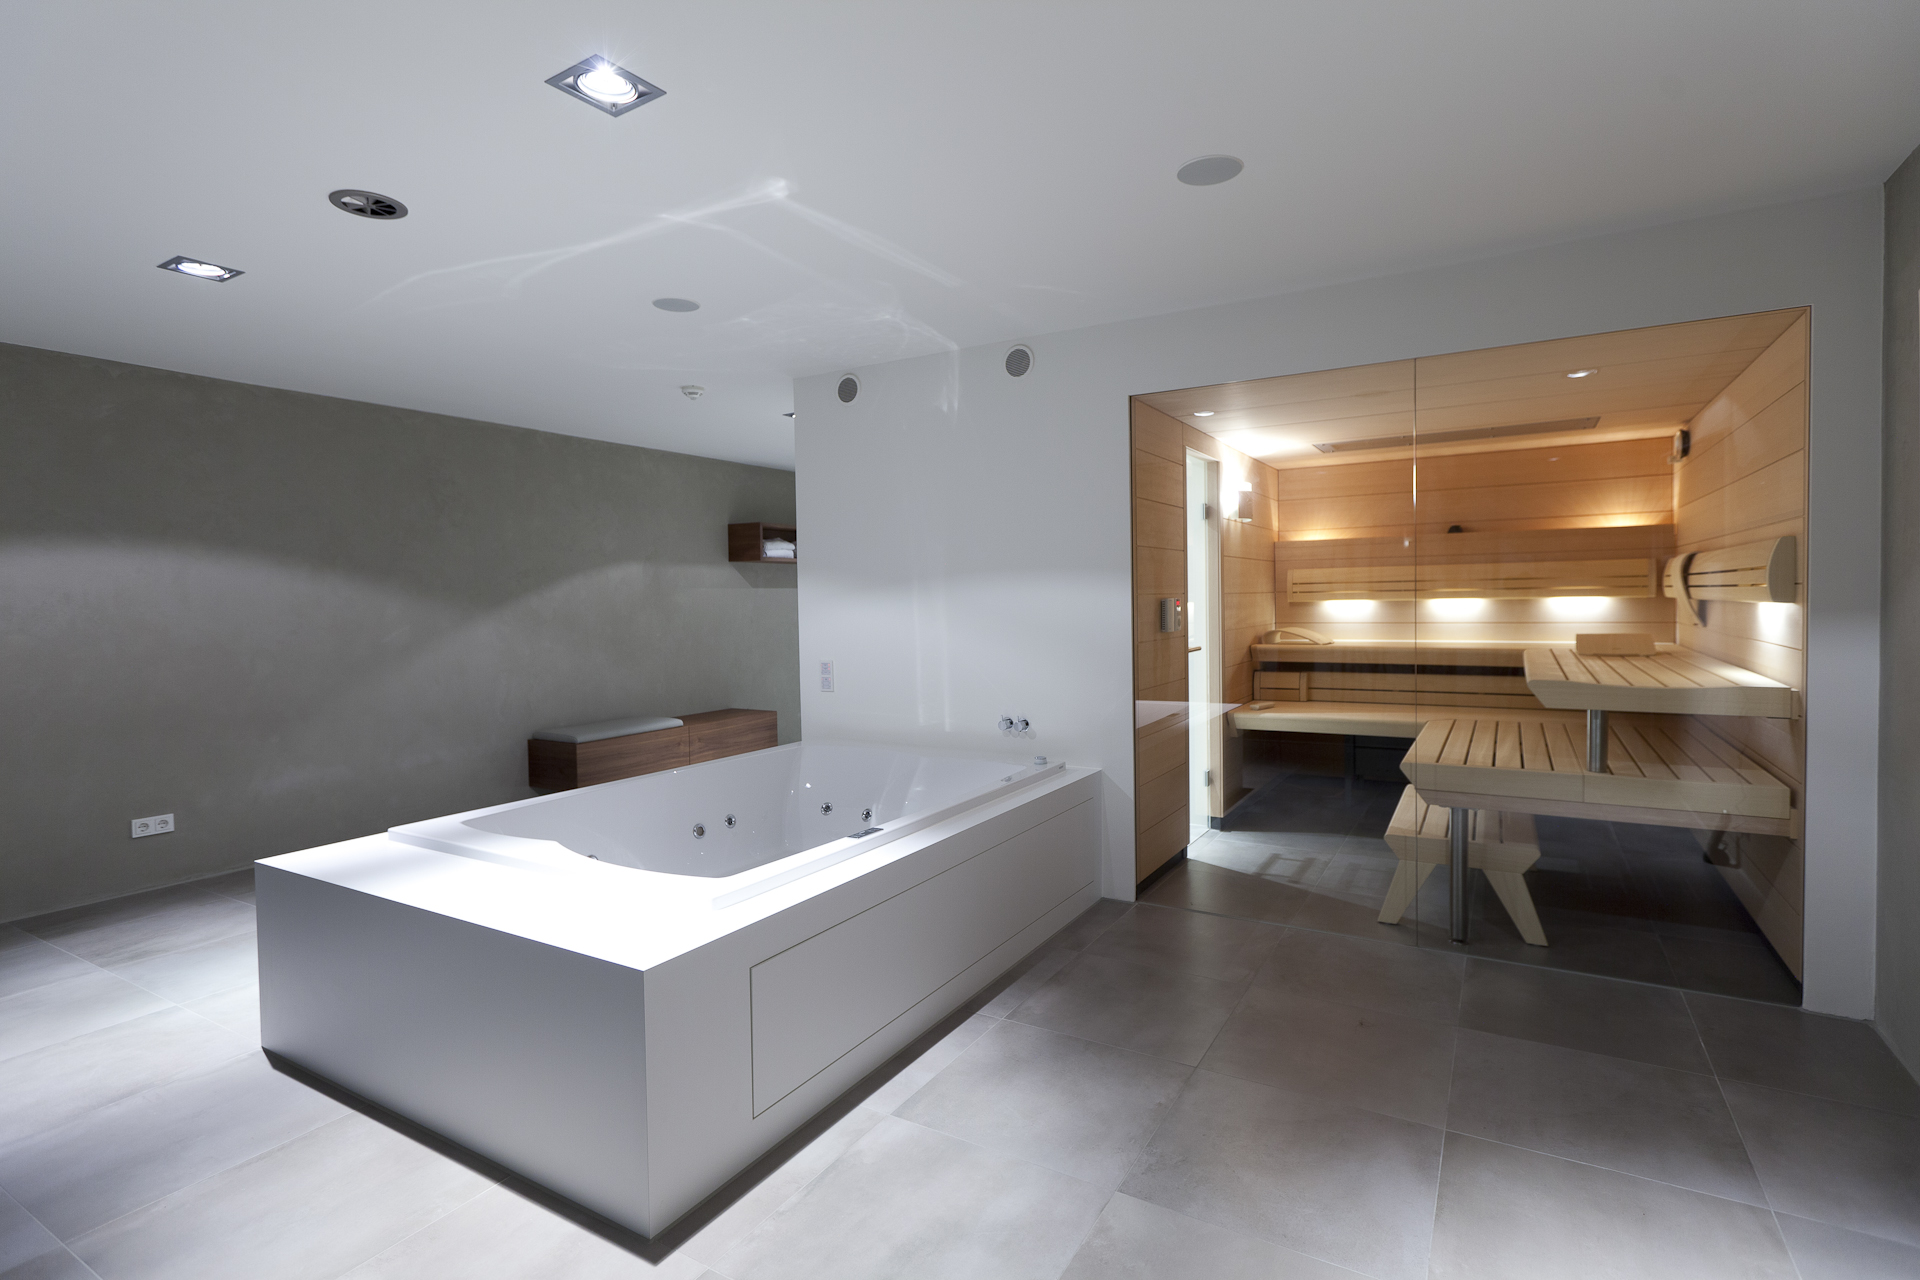 Peter_Leenders_Fotografie_Wrede_Architekten-15